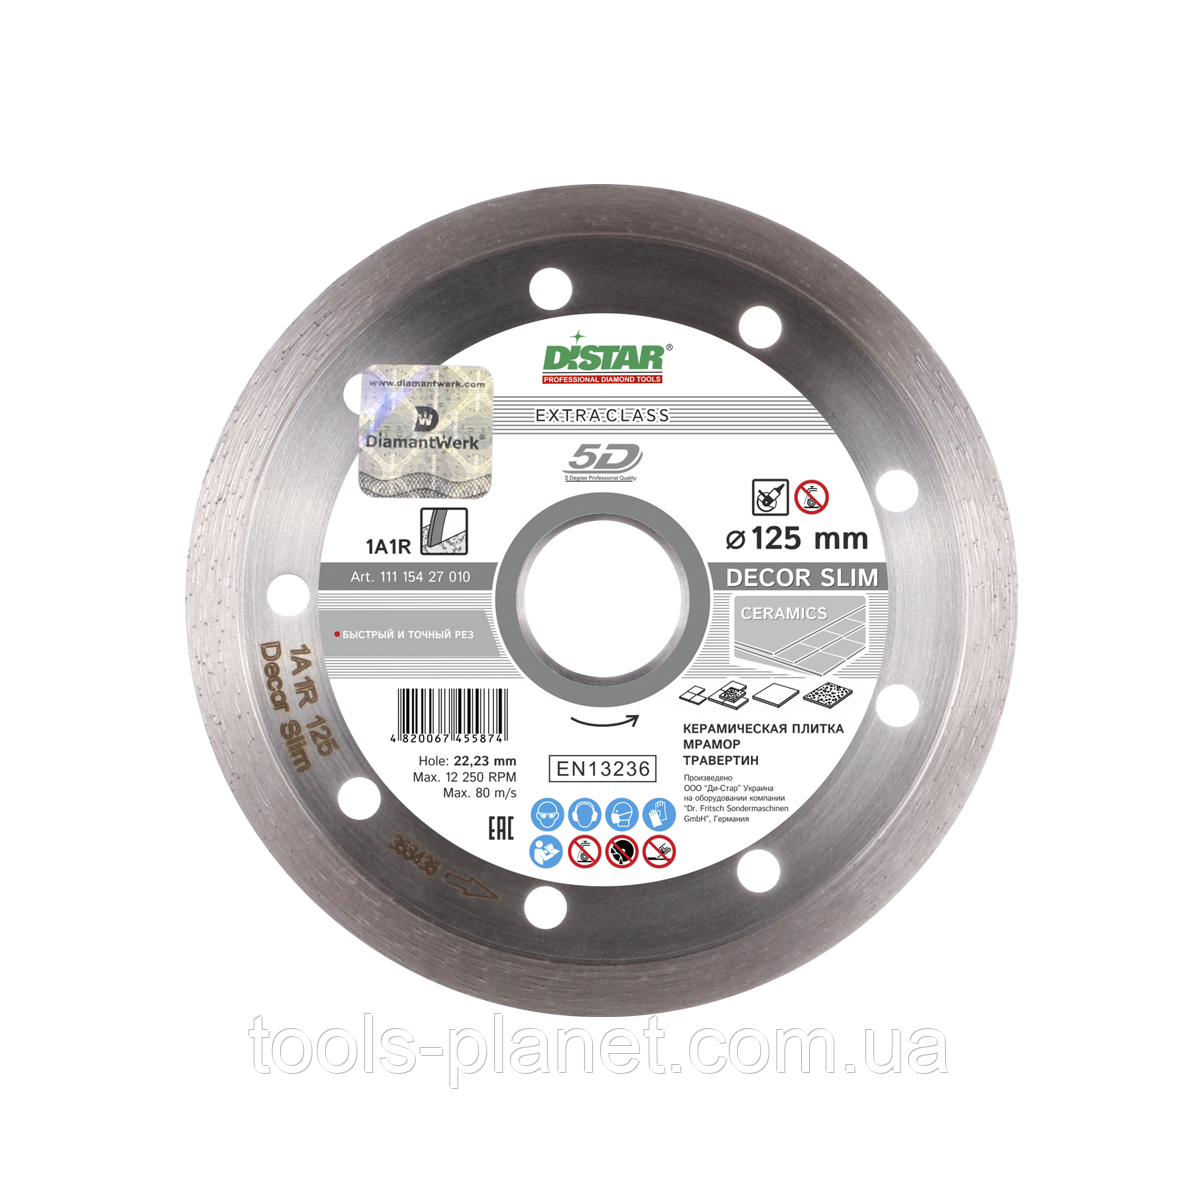 Алмазный диск Distar 1A1R 115 x 1,2 x 8 x 22,23 Decor Slim 5D (11115427009)